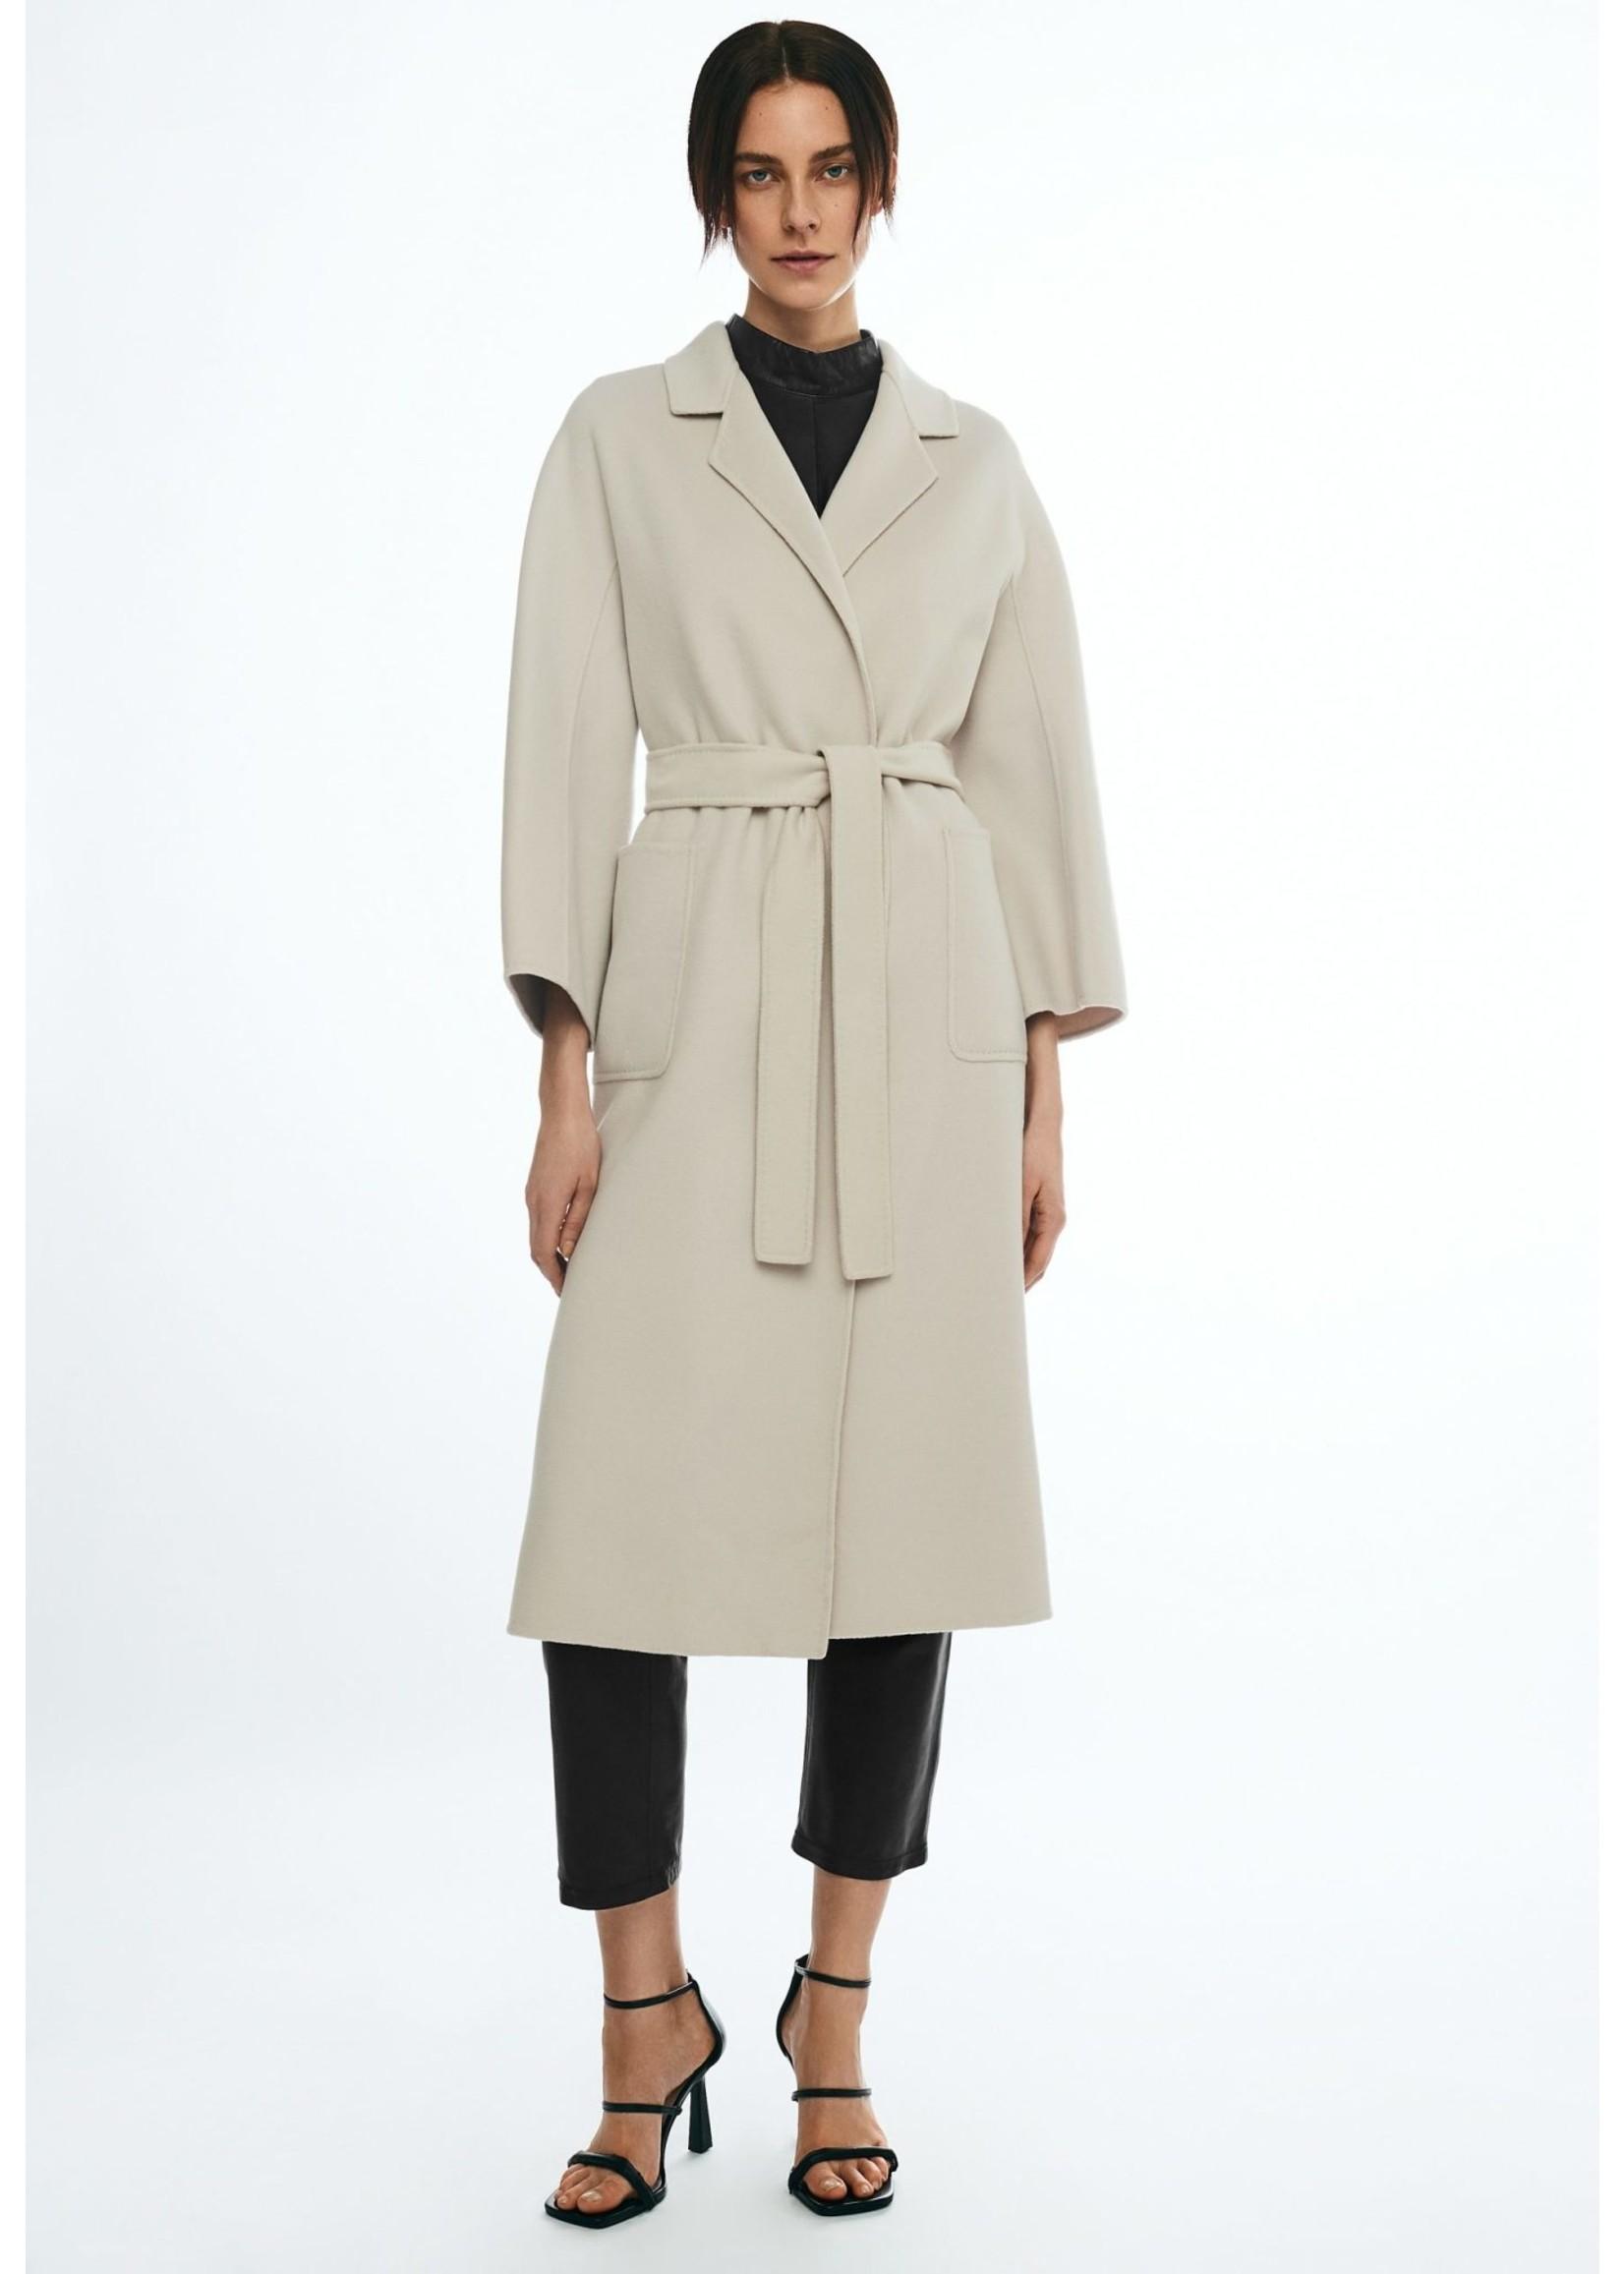 Arma Seguret jacket 100% wool light beige